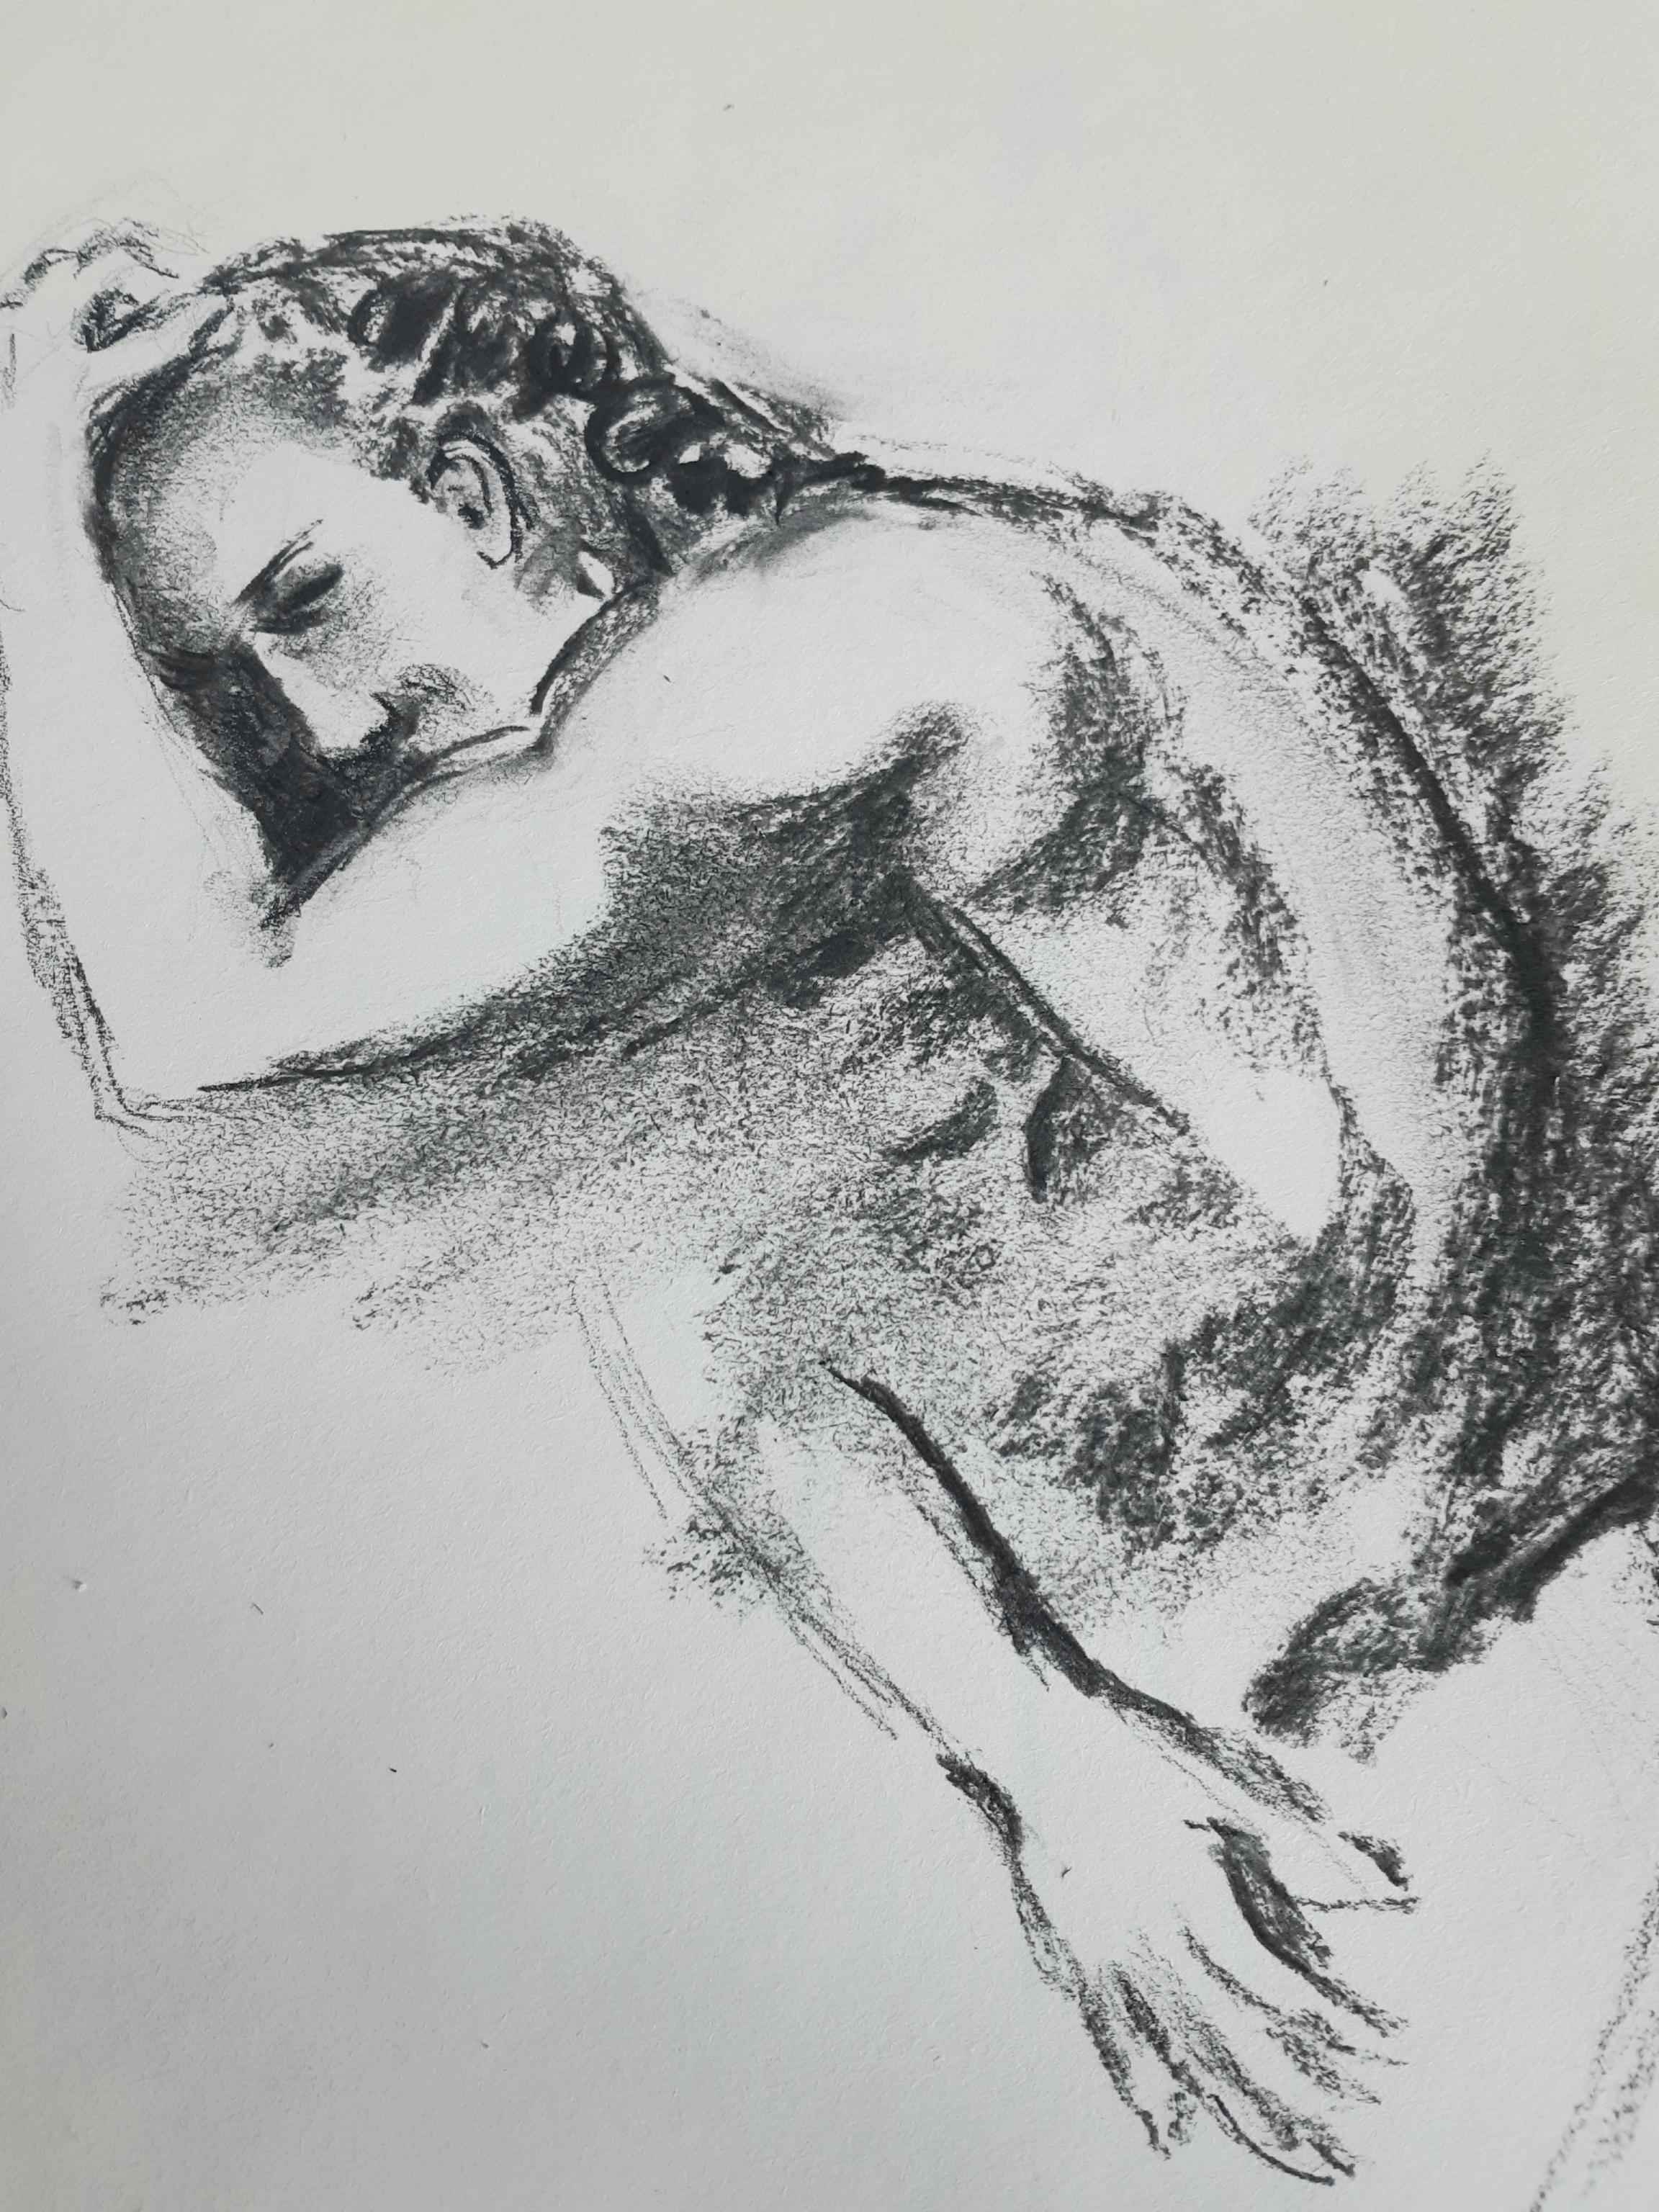 Esquisse fusain dessin  cours de dessin